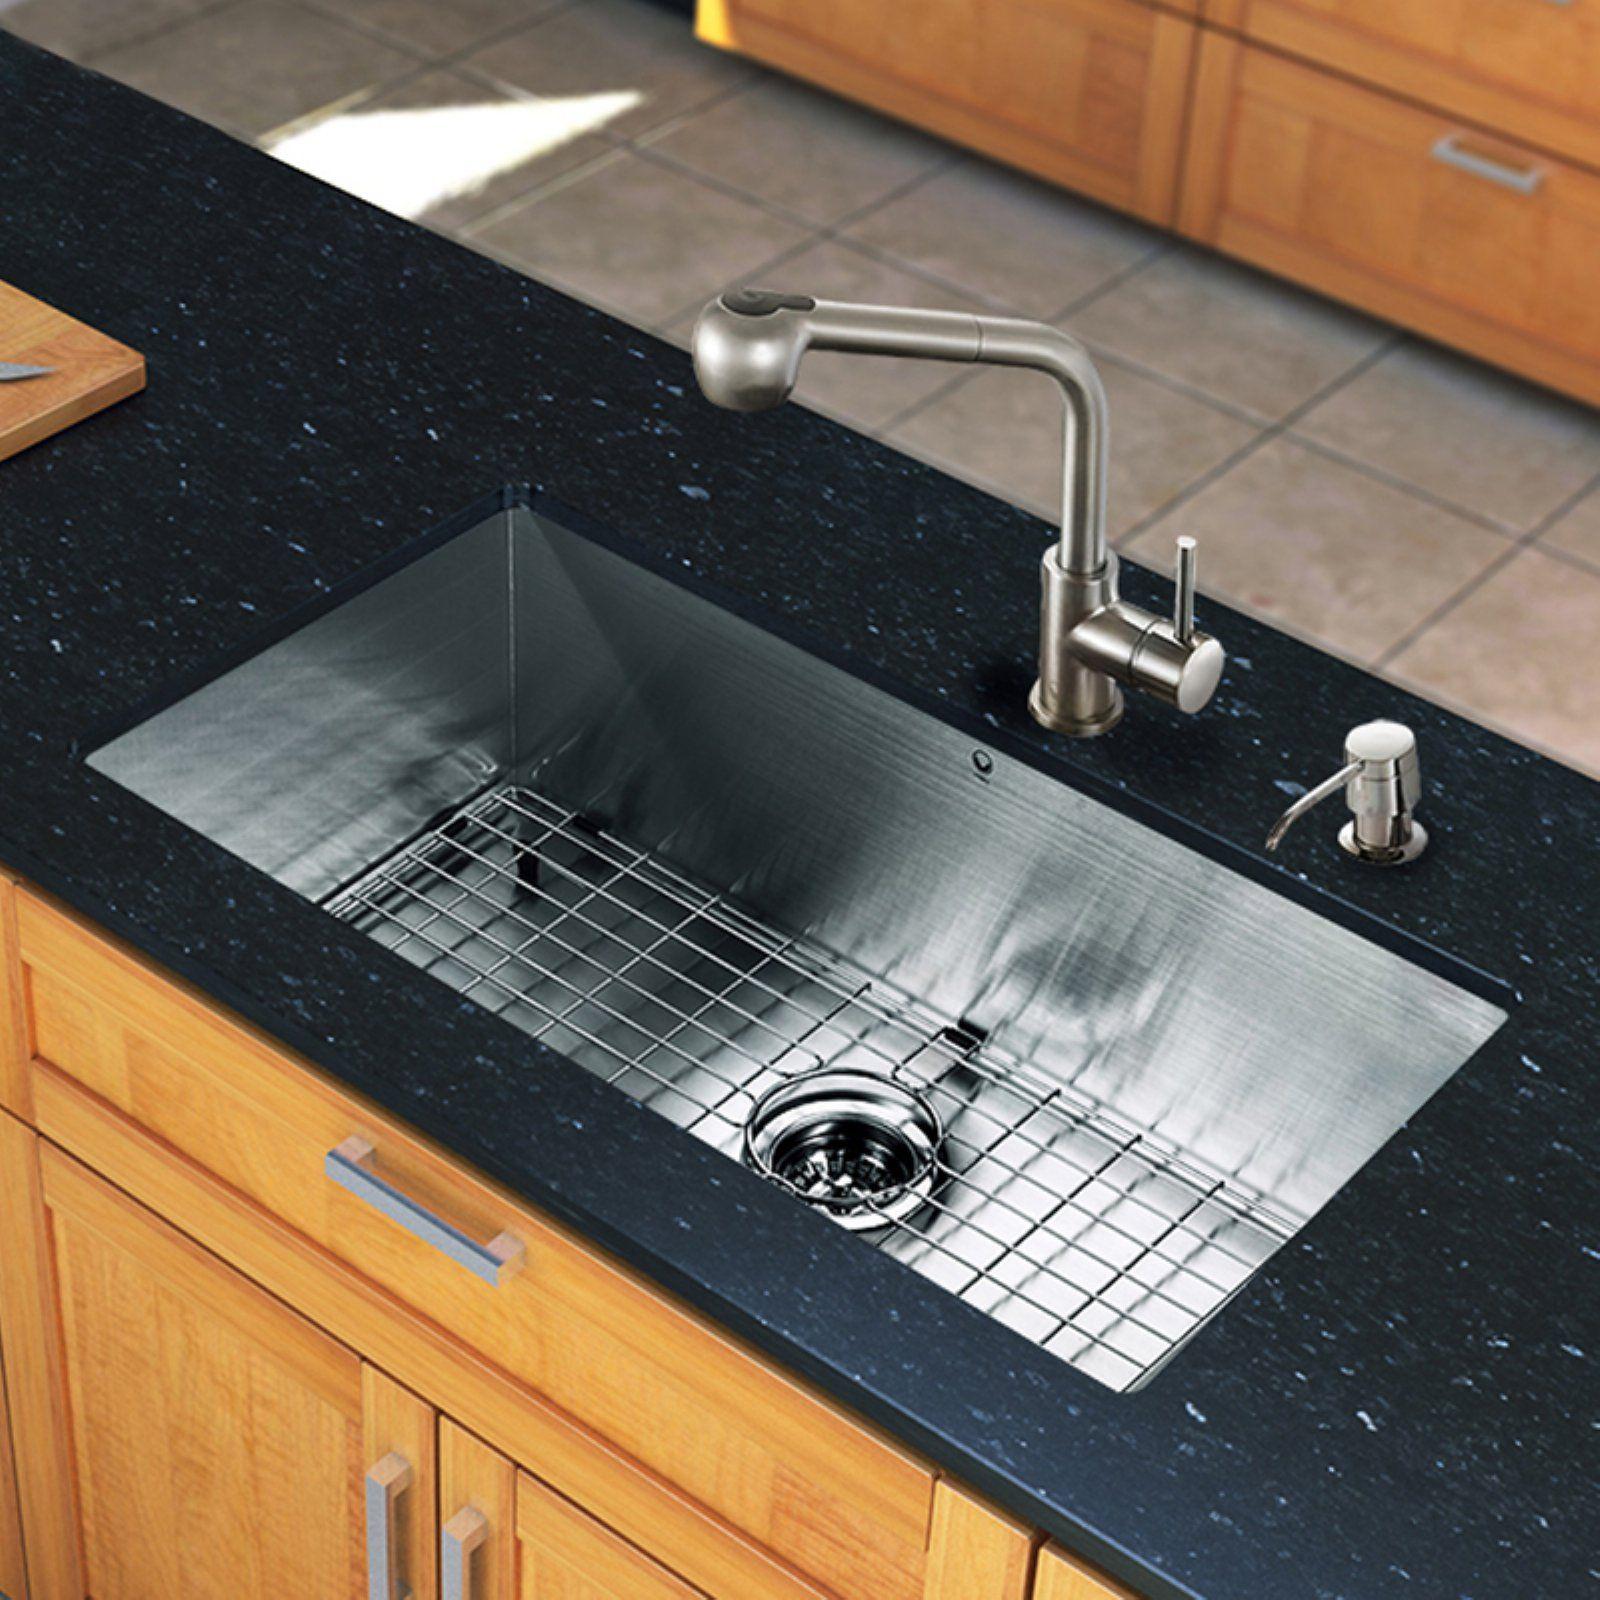 Vigo All In One Vg15248 Single Basin Undermount Kitchen Sink And